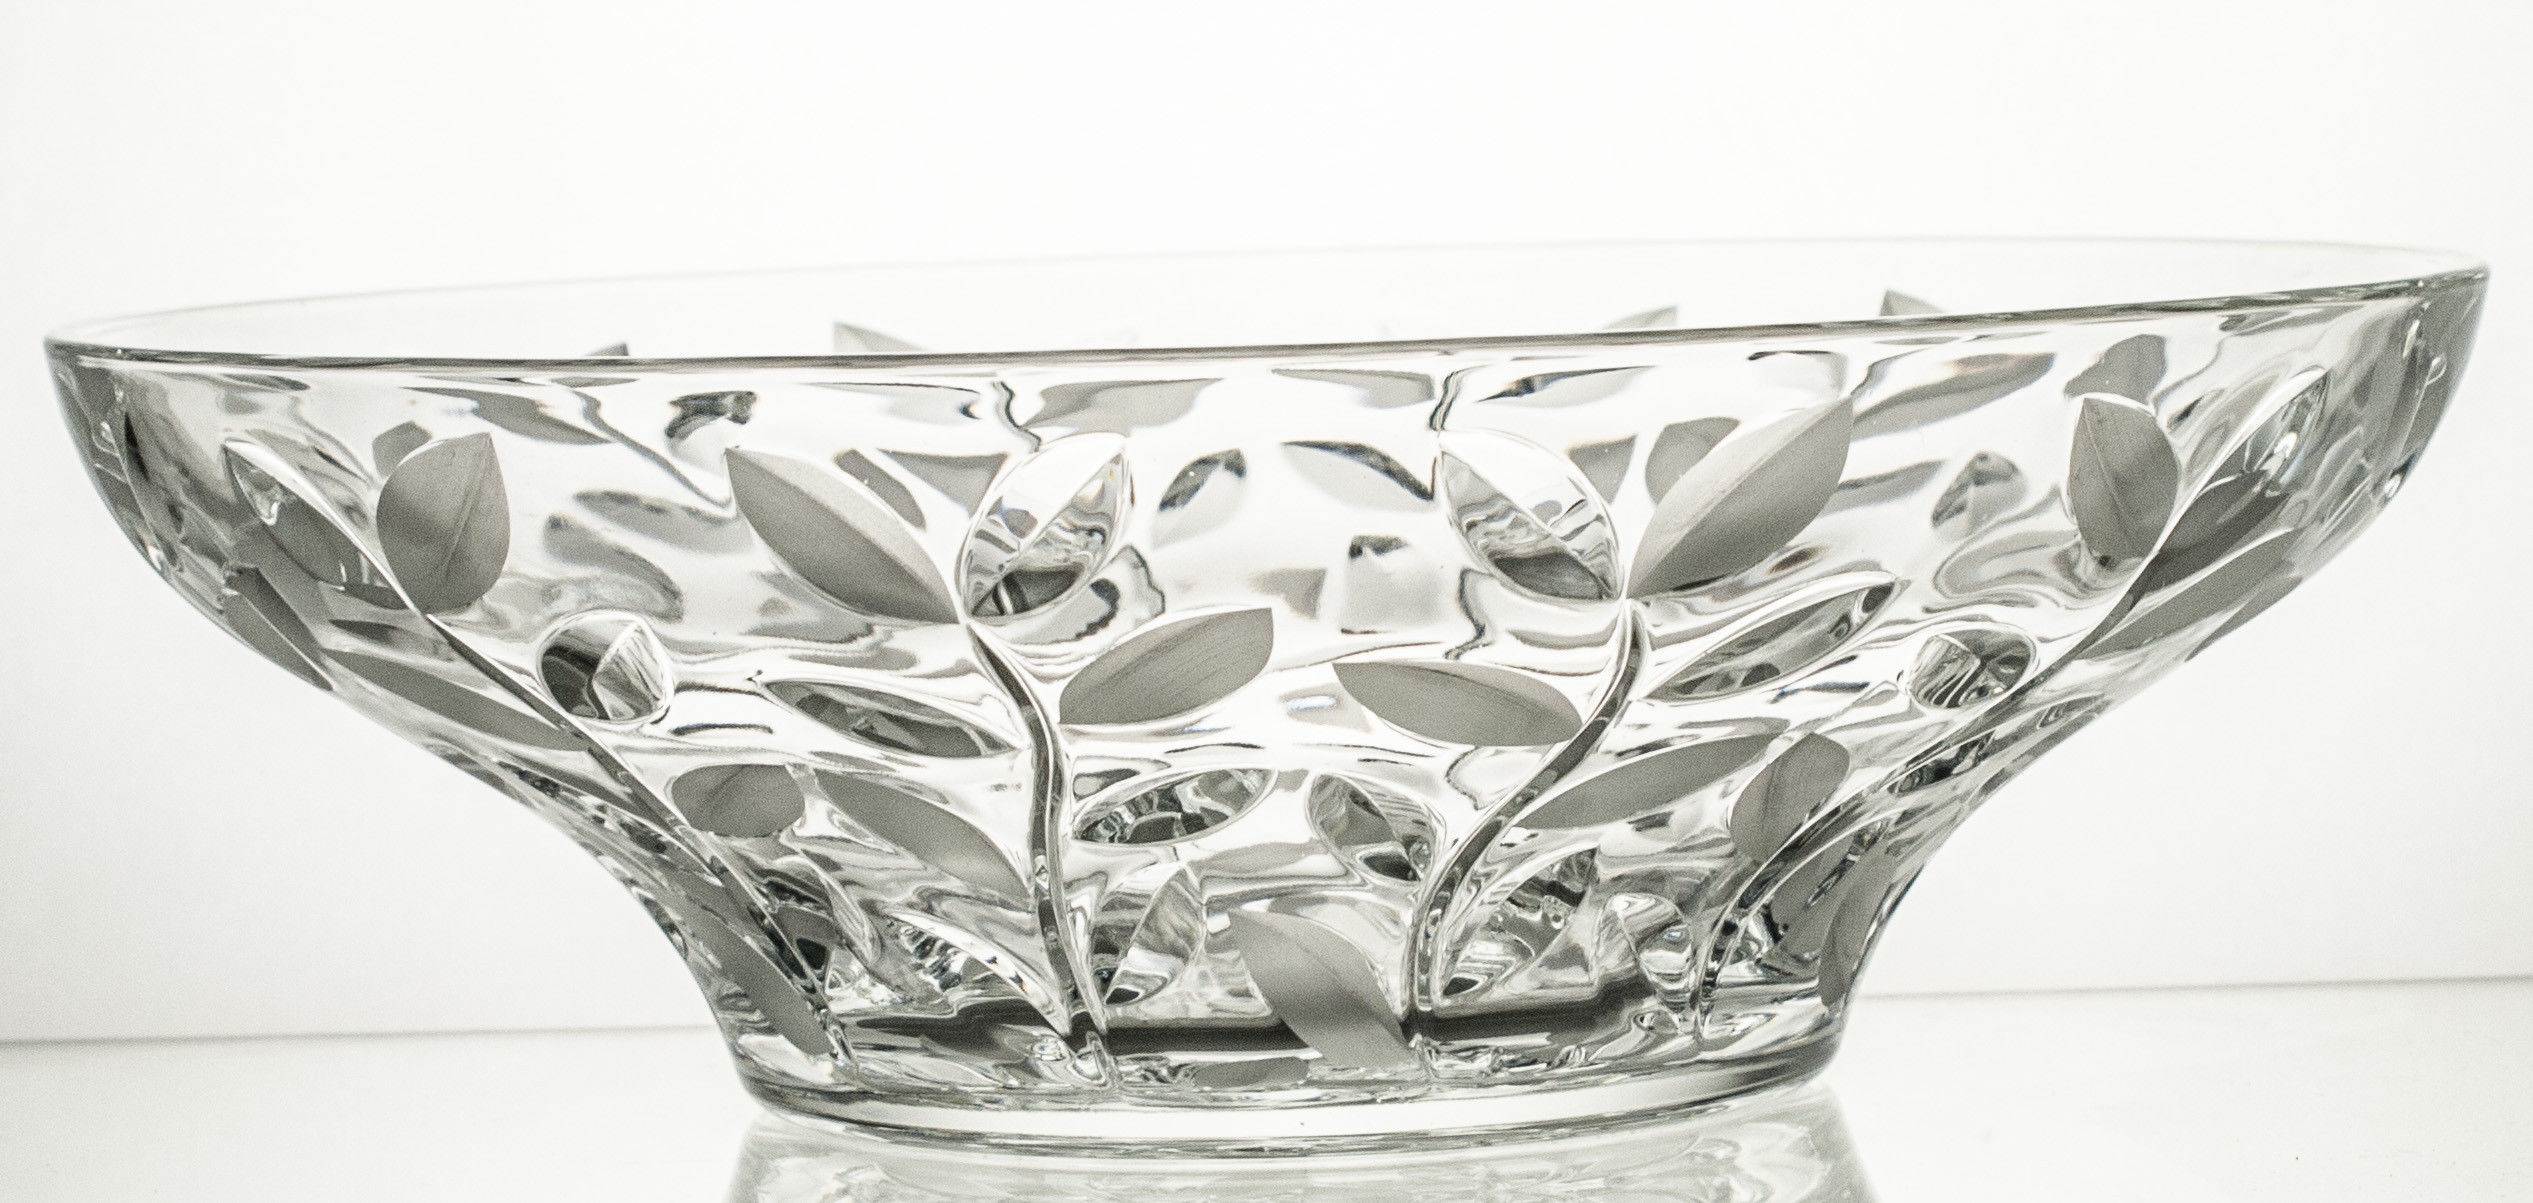 Owocarka kryształowa (13676)